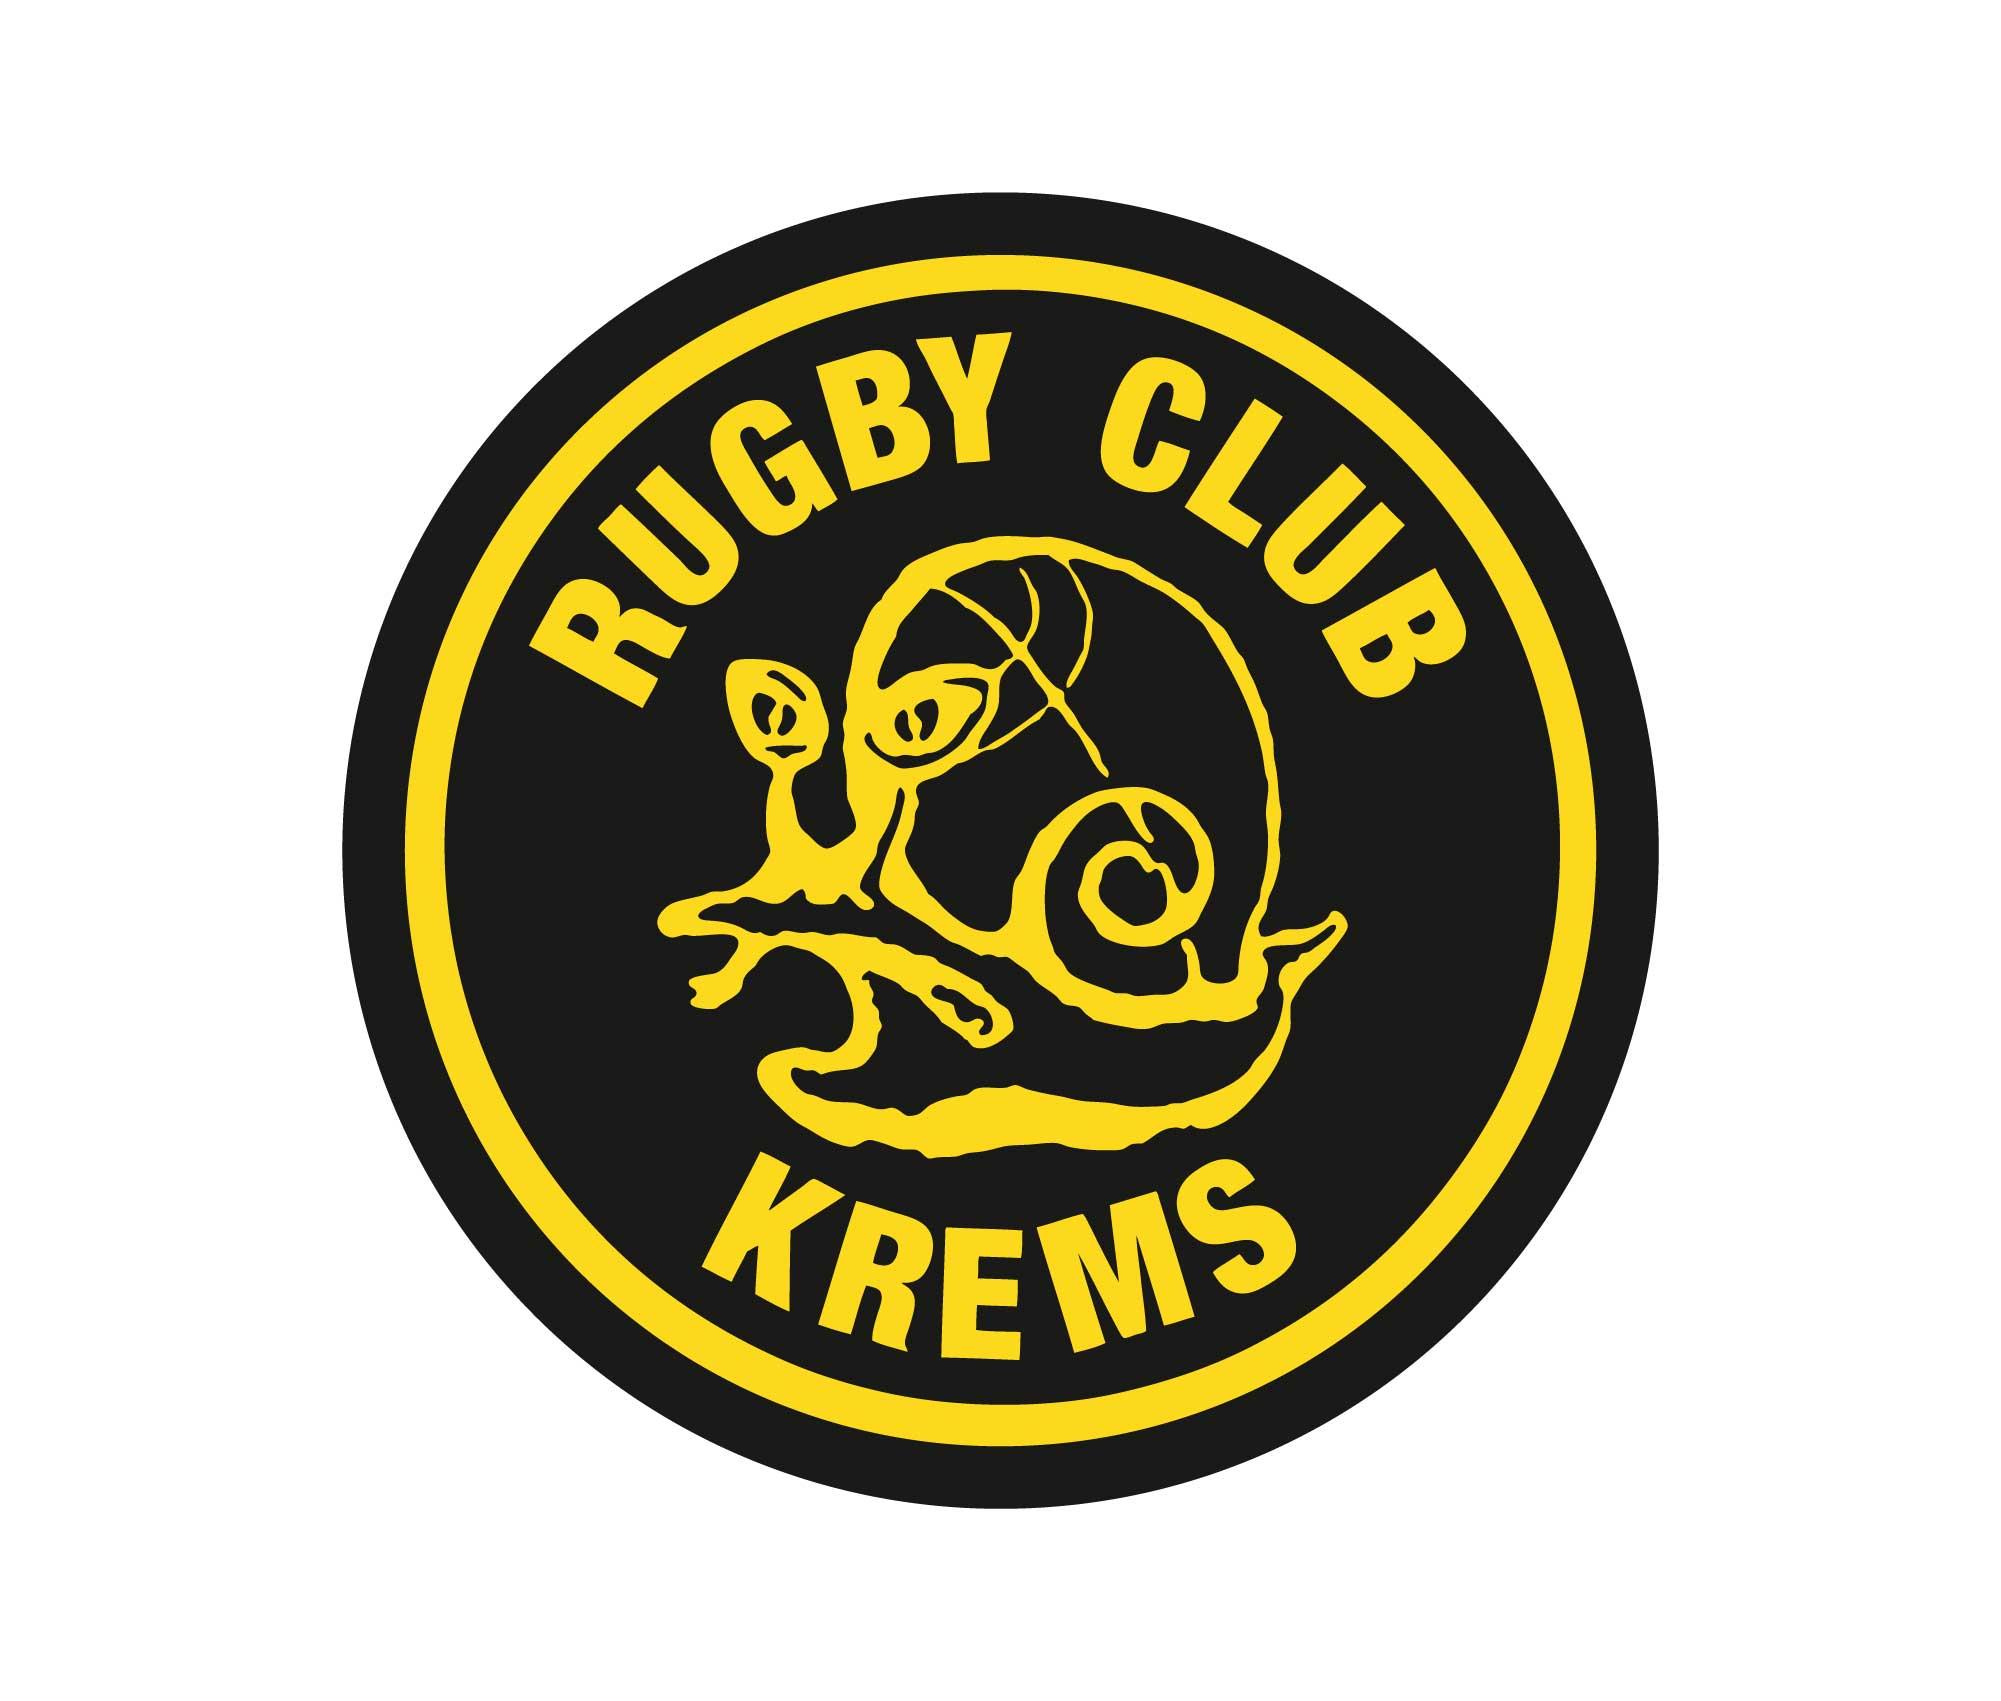 Rugby Club Krems Aufnäher